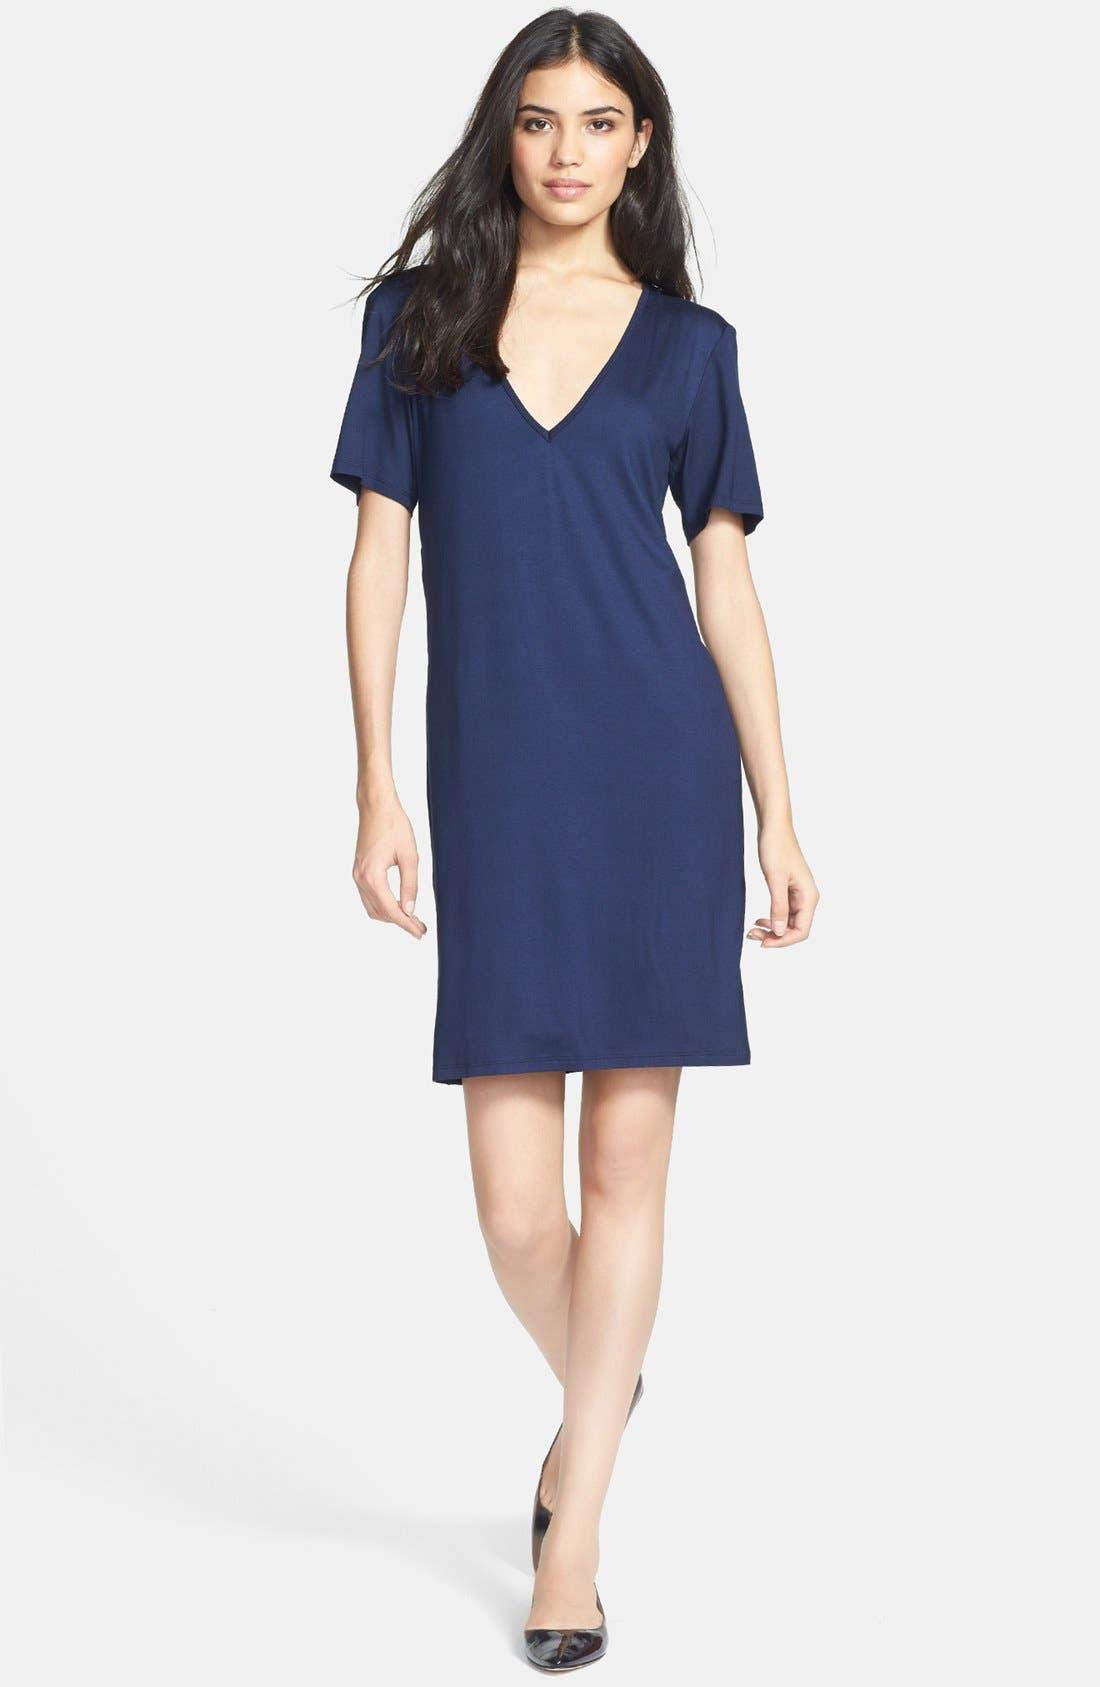 Alternate Image 1 Selected - Trina Turk 'Lanna' Jersey T-Shirt Dress